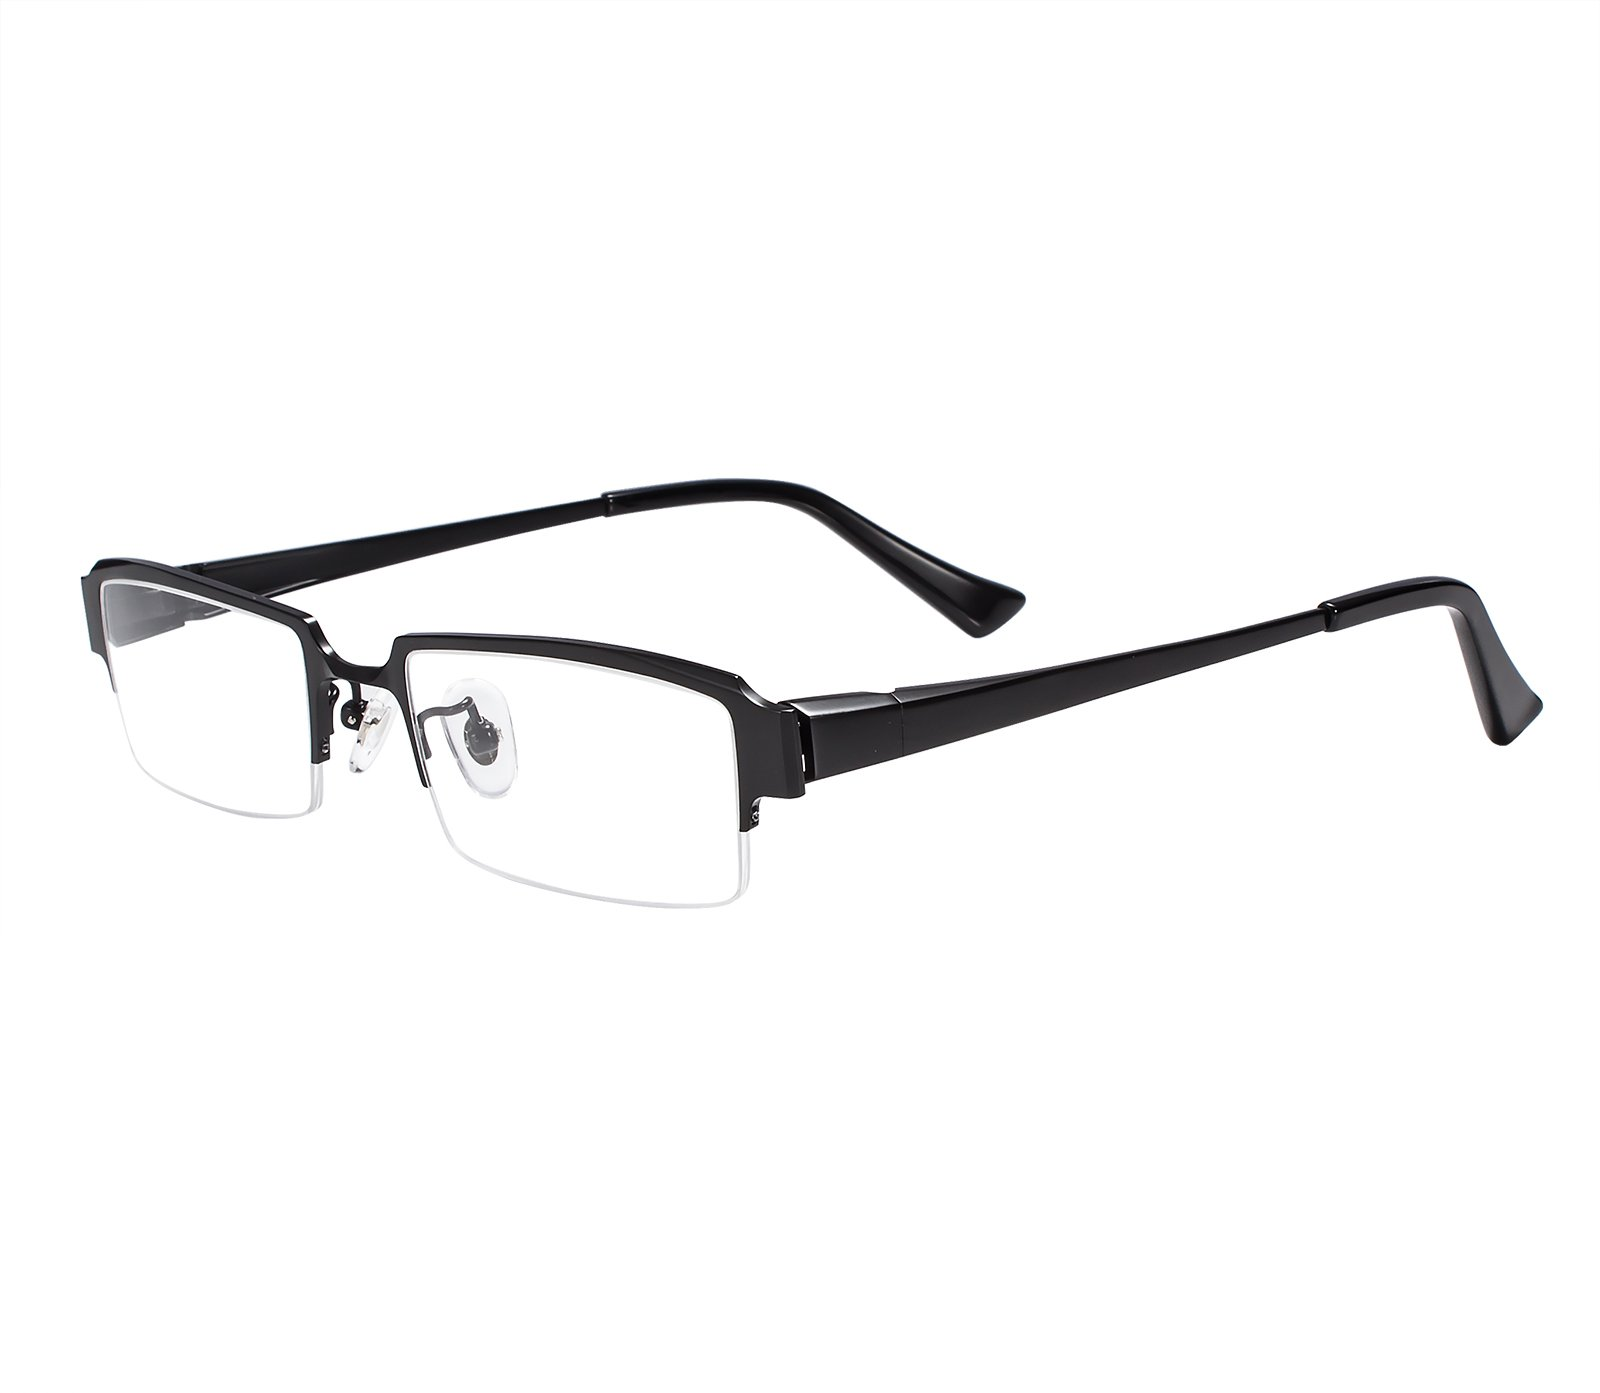 Agstum Pure Titanium Half Rim Optical Business Glasses Frame Clear Lens Rx (Black, 52)